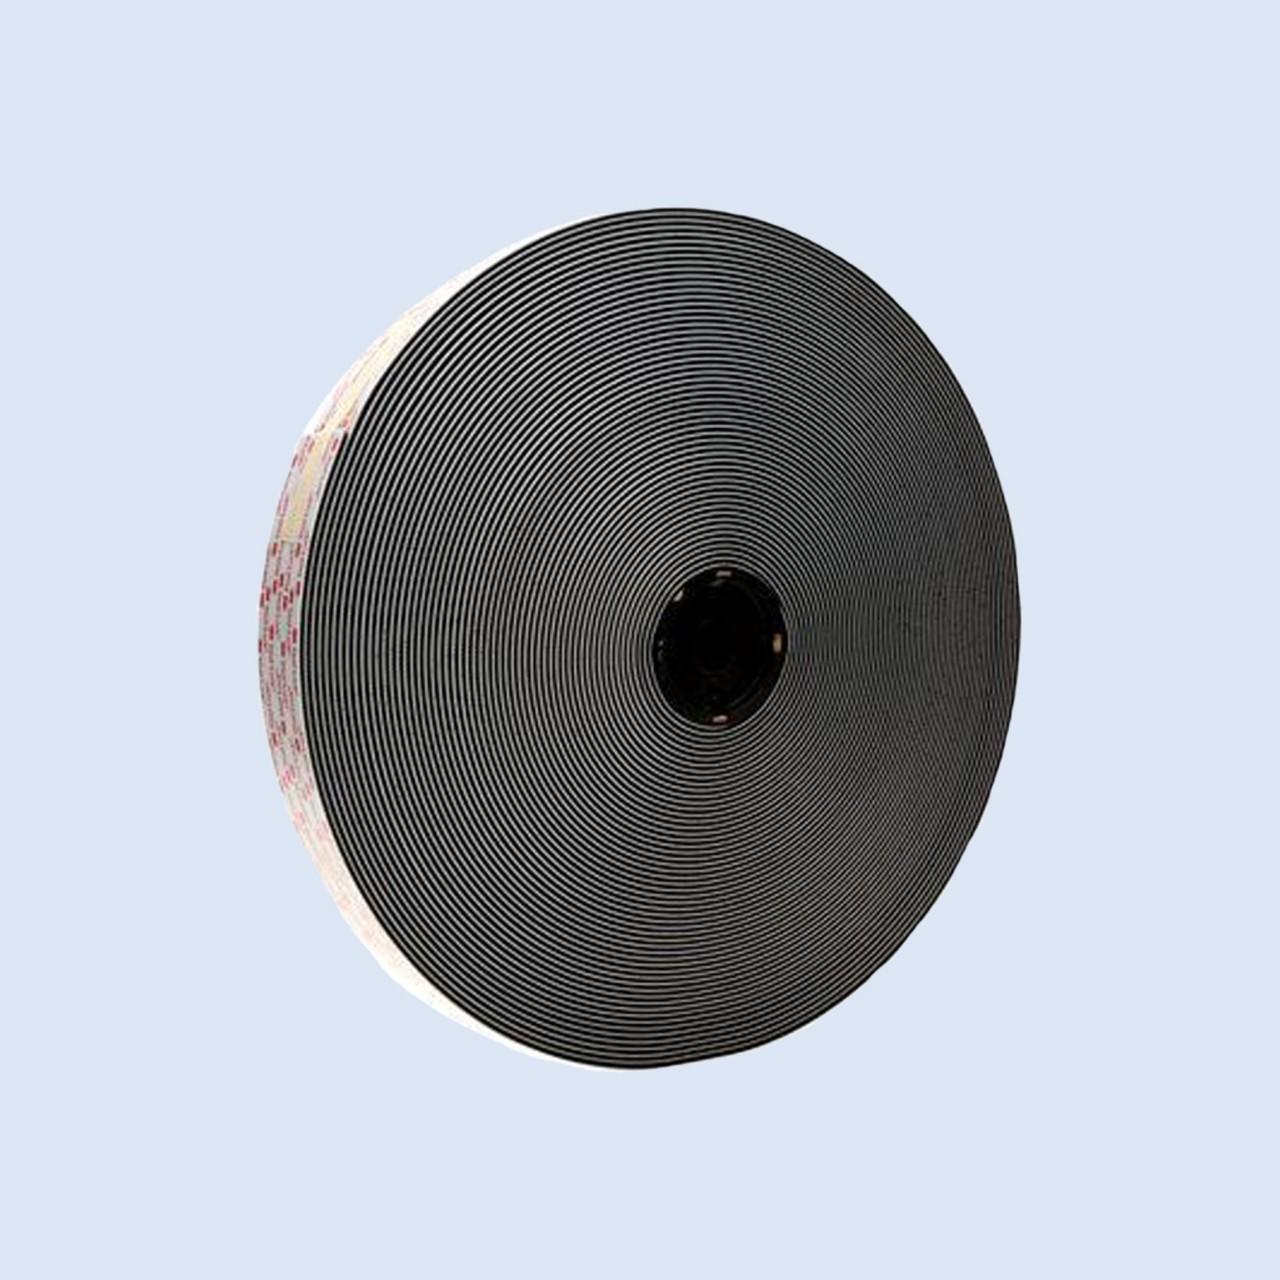 3M SJ 3552, Dual Lock Druckverschluss Klettband, 50 mm x 46 m